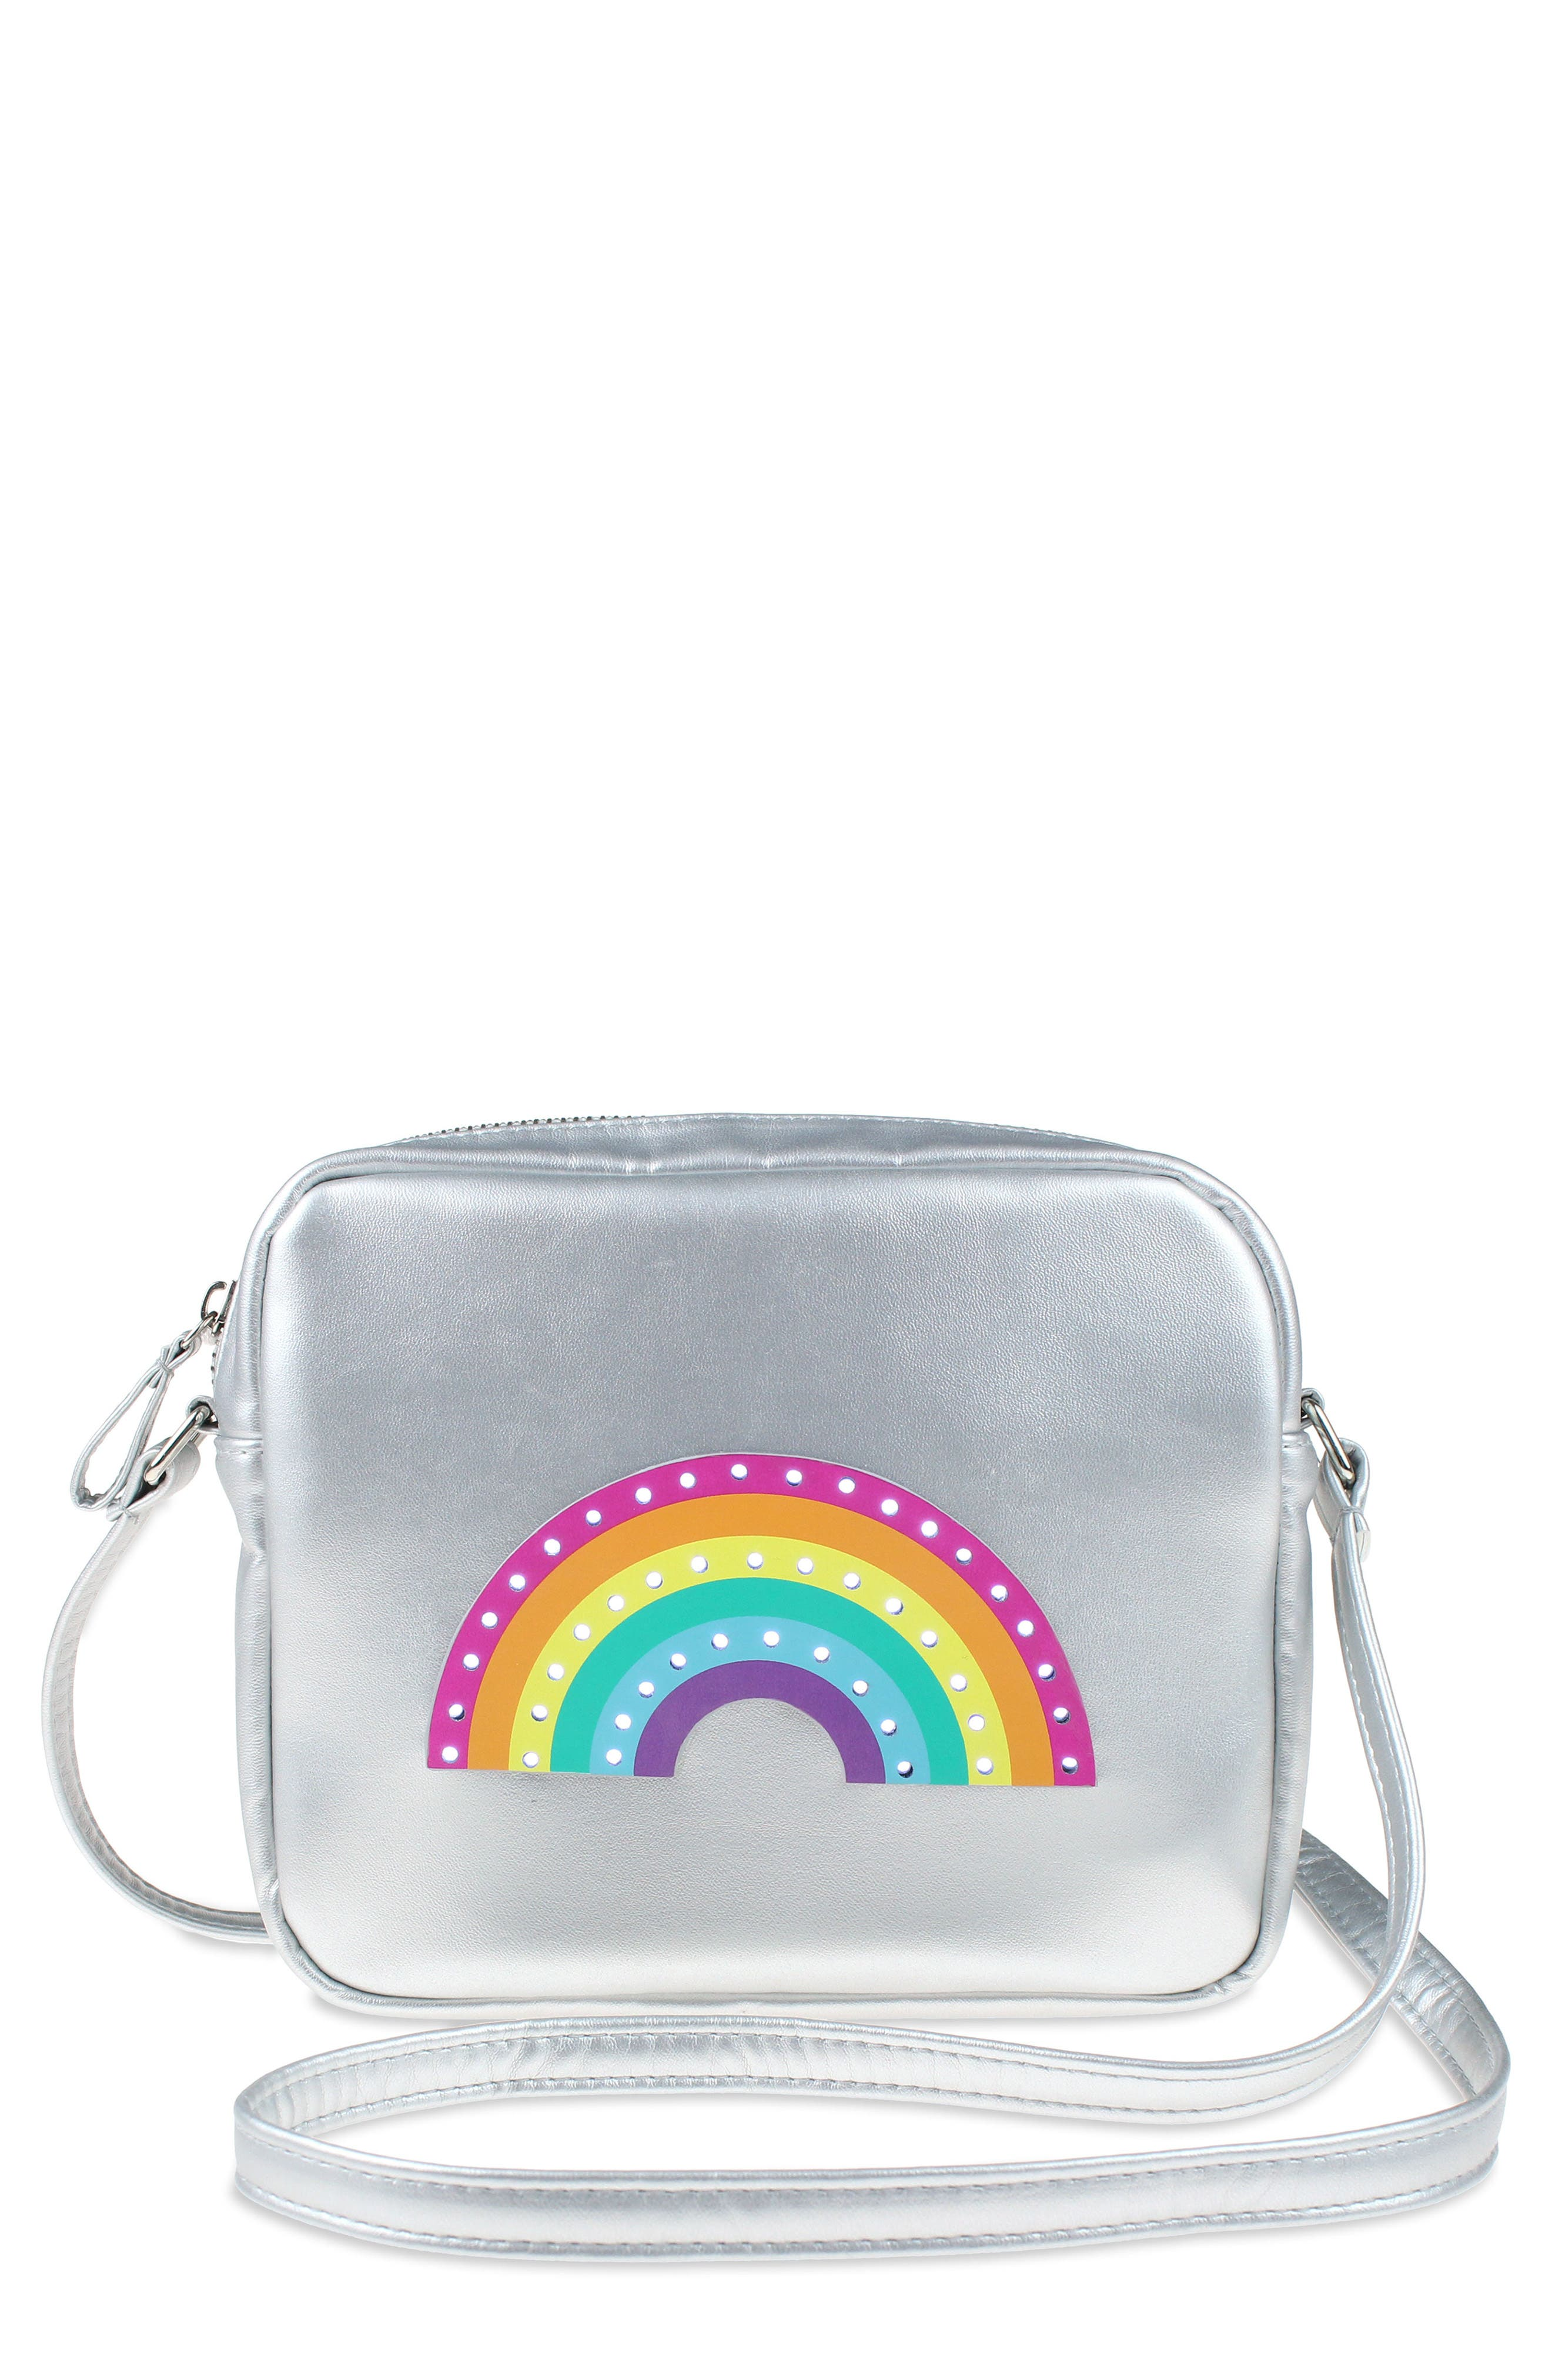 CAPELLI NEW YORK Capelli LED Light-Up Rainbow Faux Leather Crossbody Bag, Main, color, 047